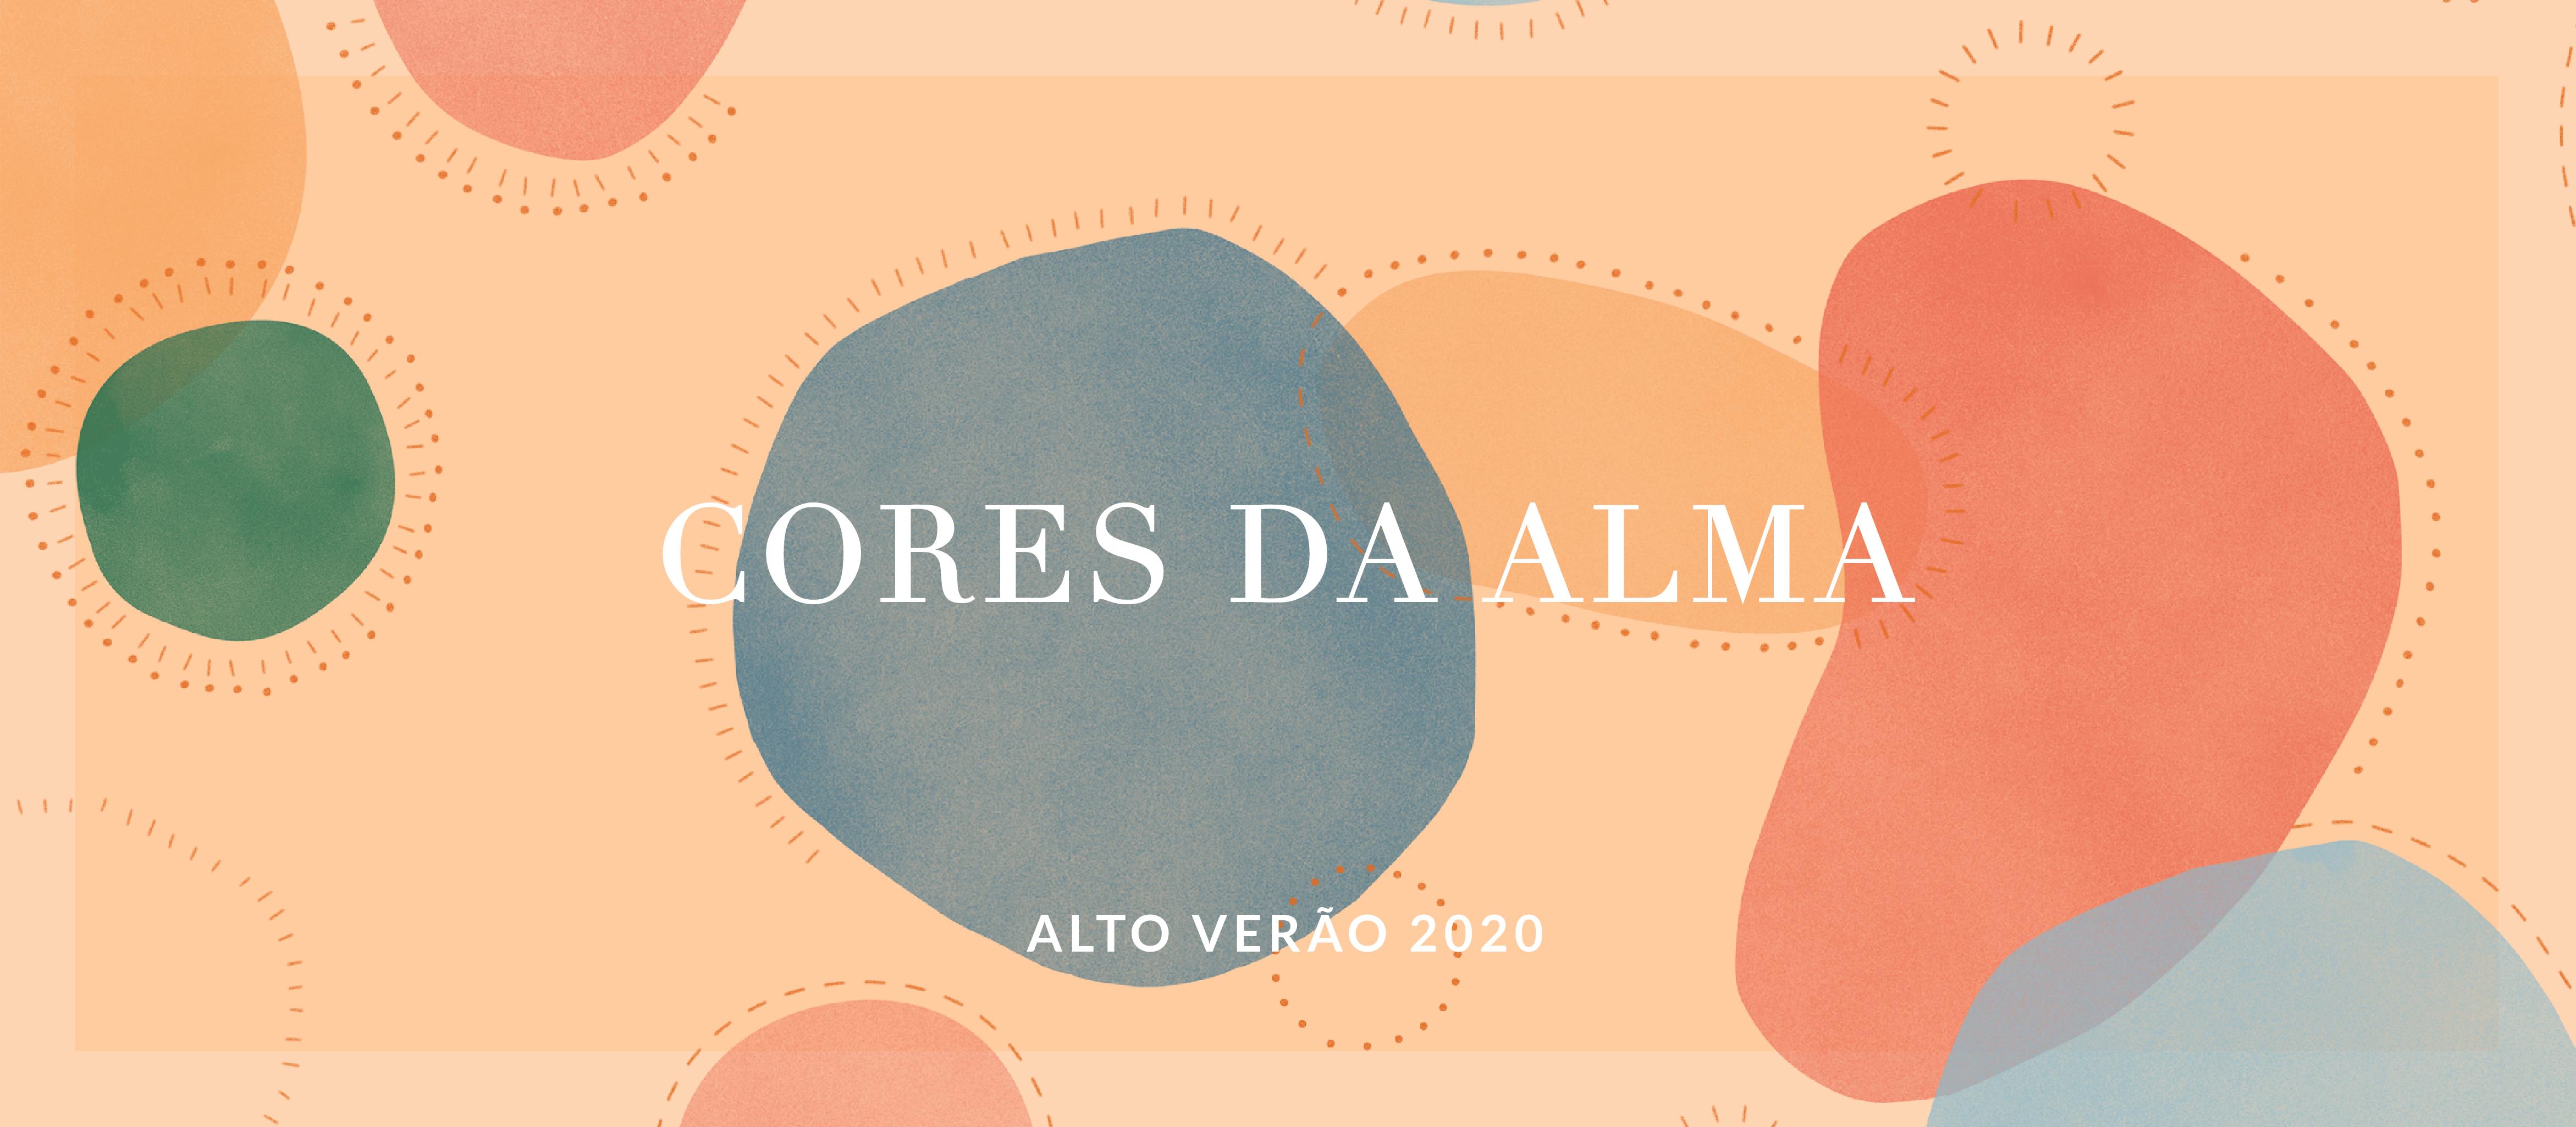 verao-2020